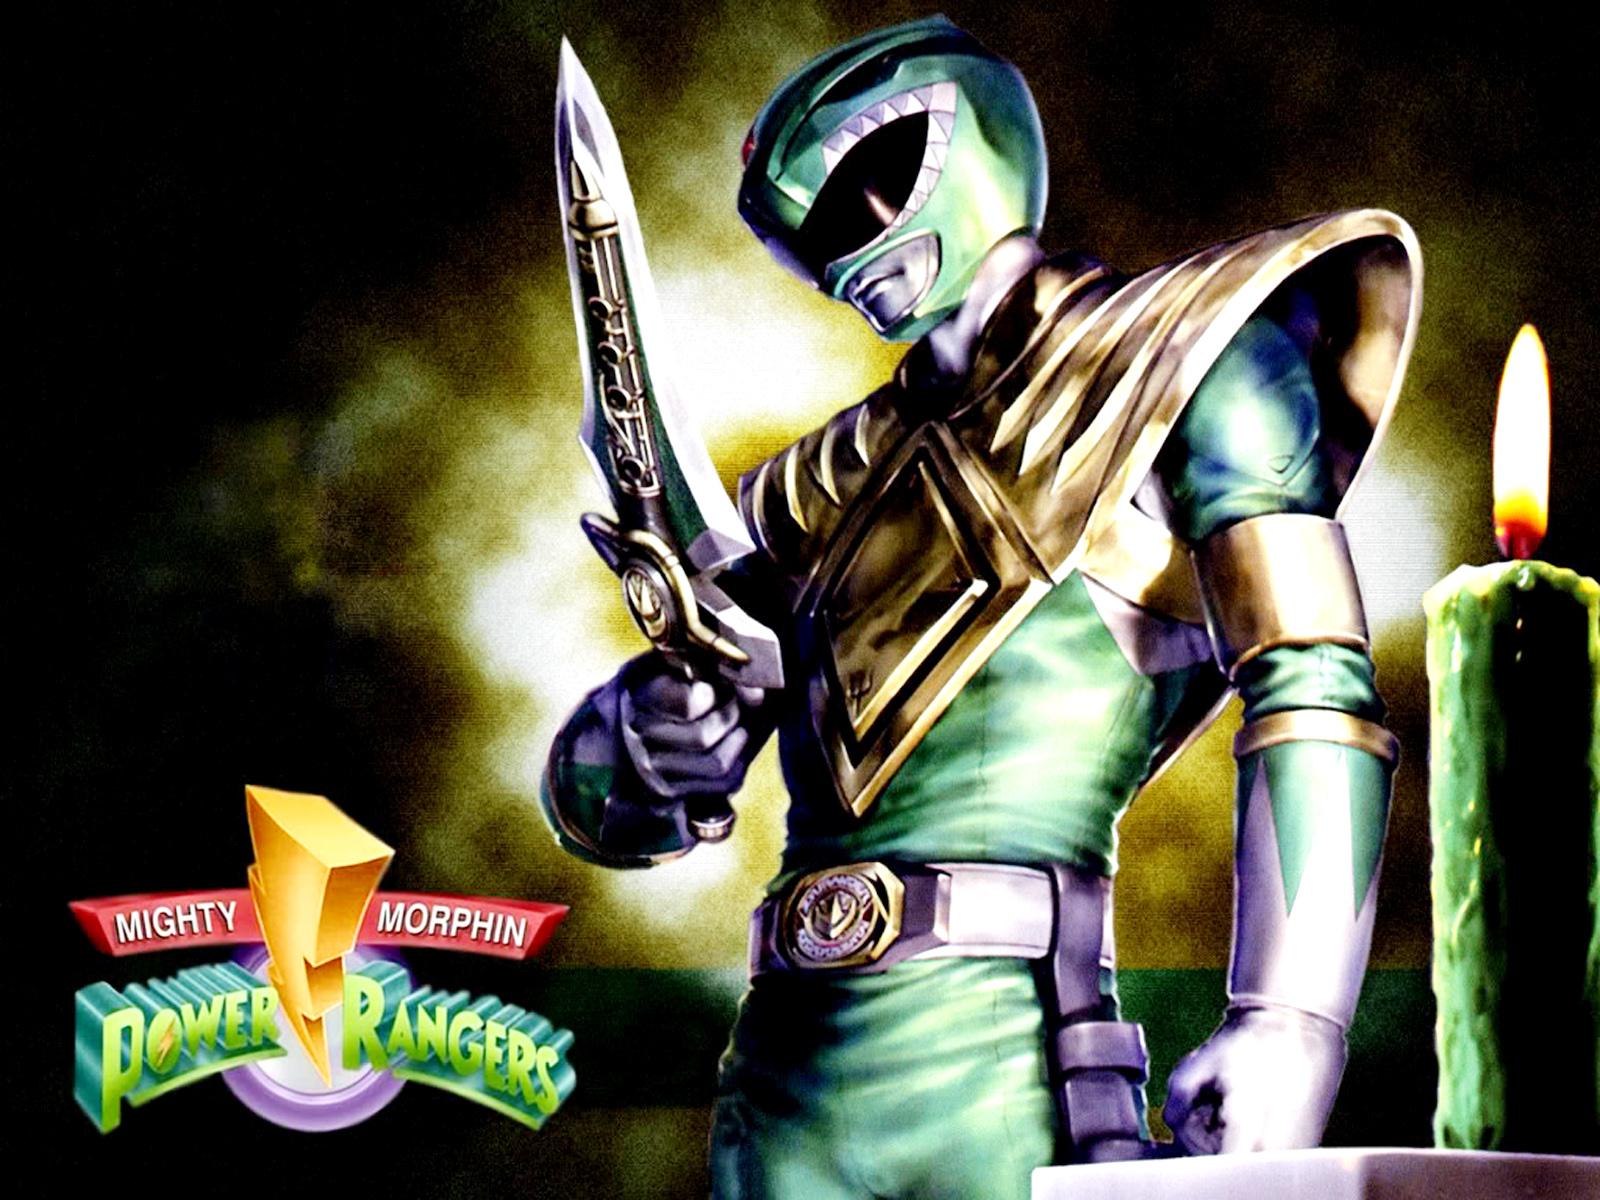 Power Rangers Desktop Wallpapers  HD Wallpapers ...